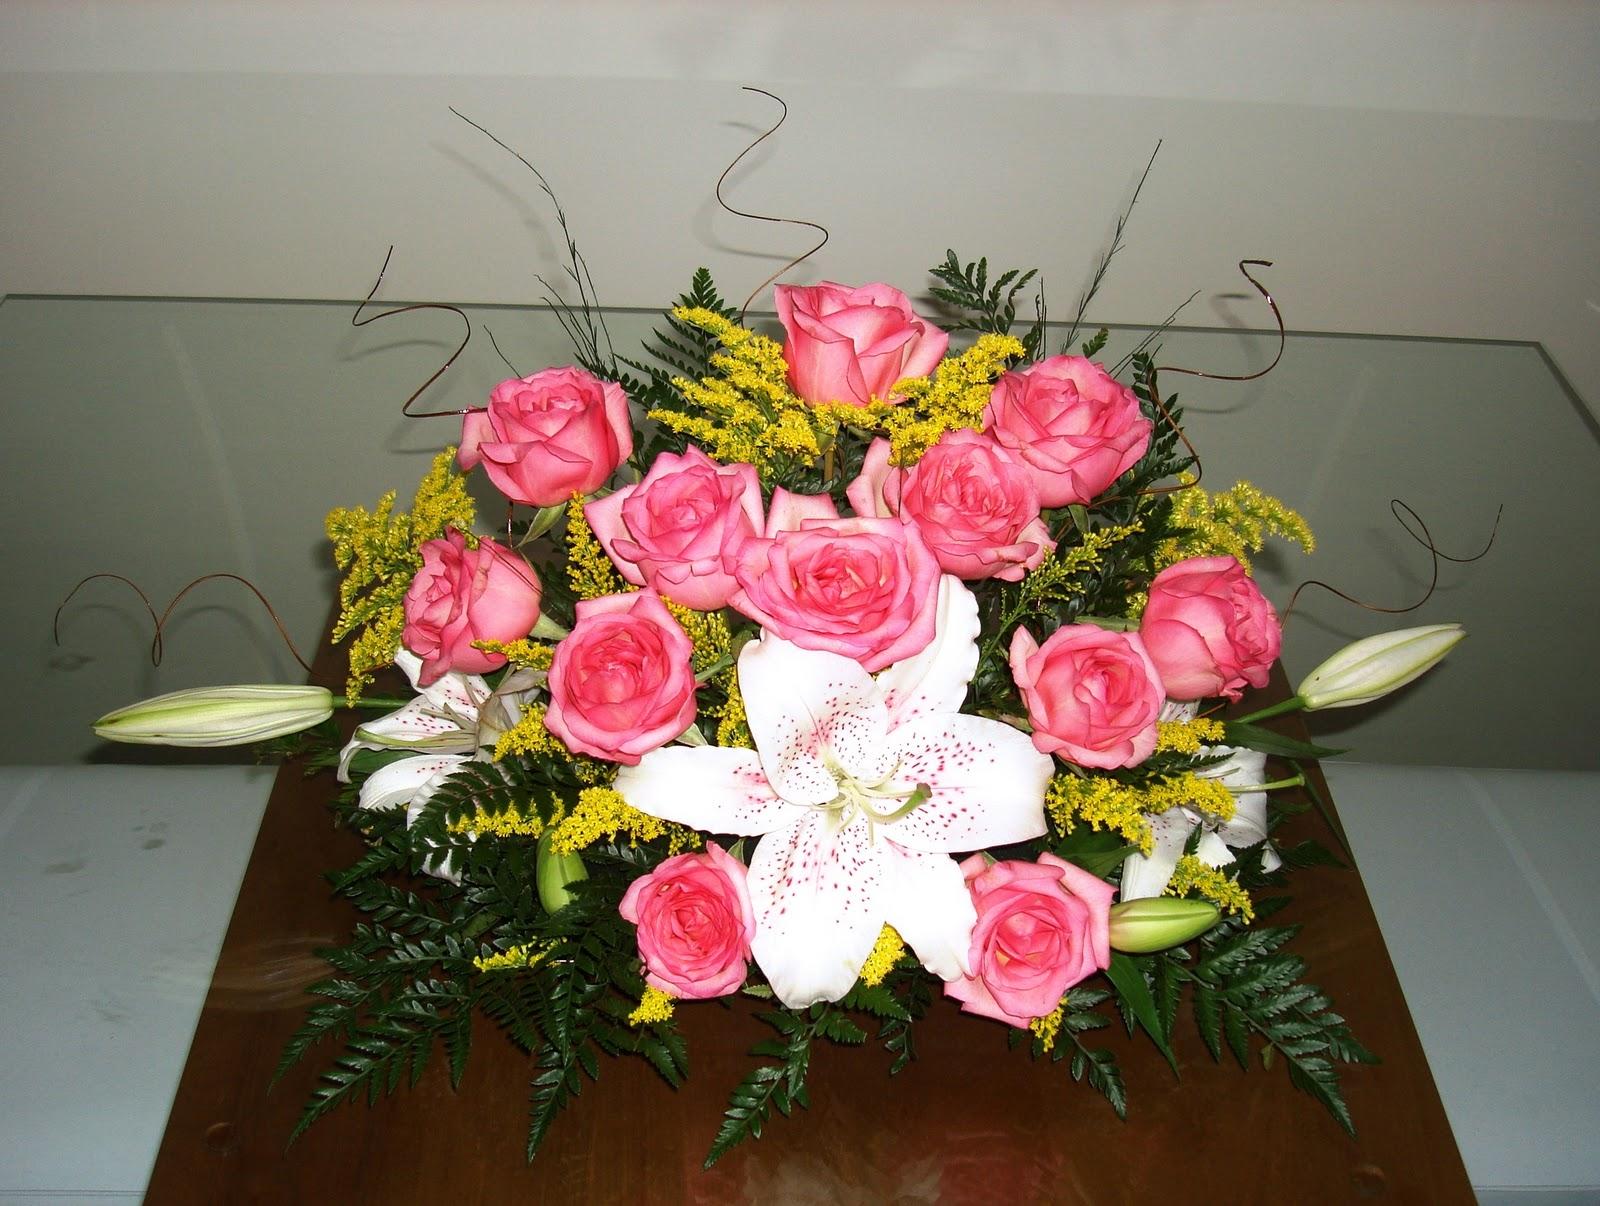 flores jardim camburi:ICM Jardim Camburi 3. Enviados por Luciana Vidal